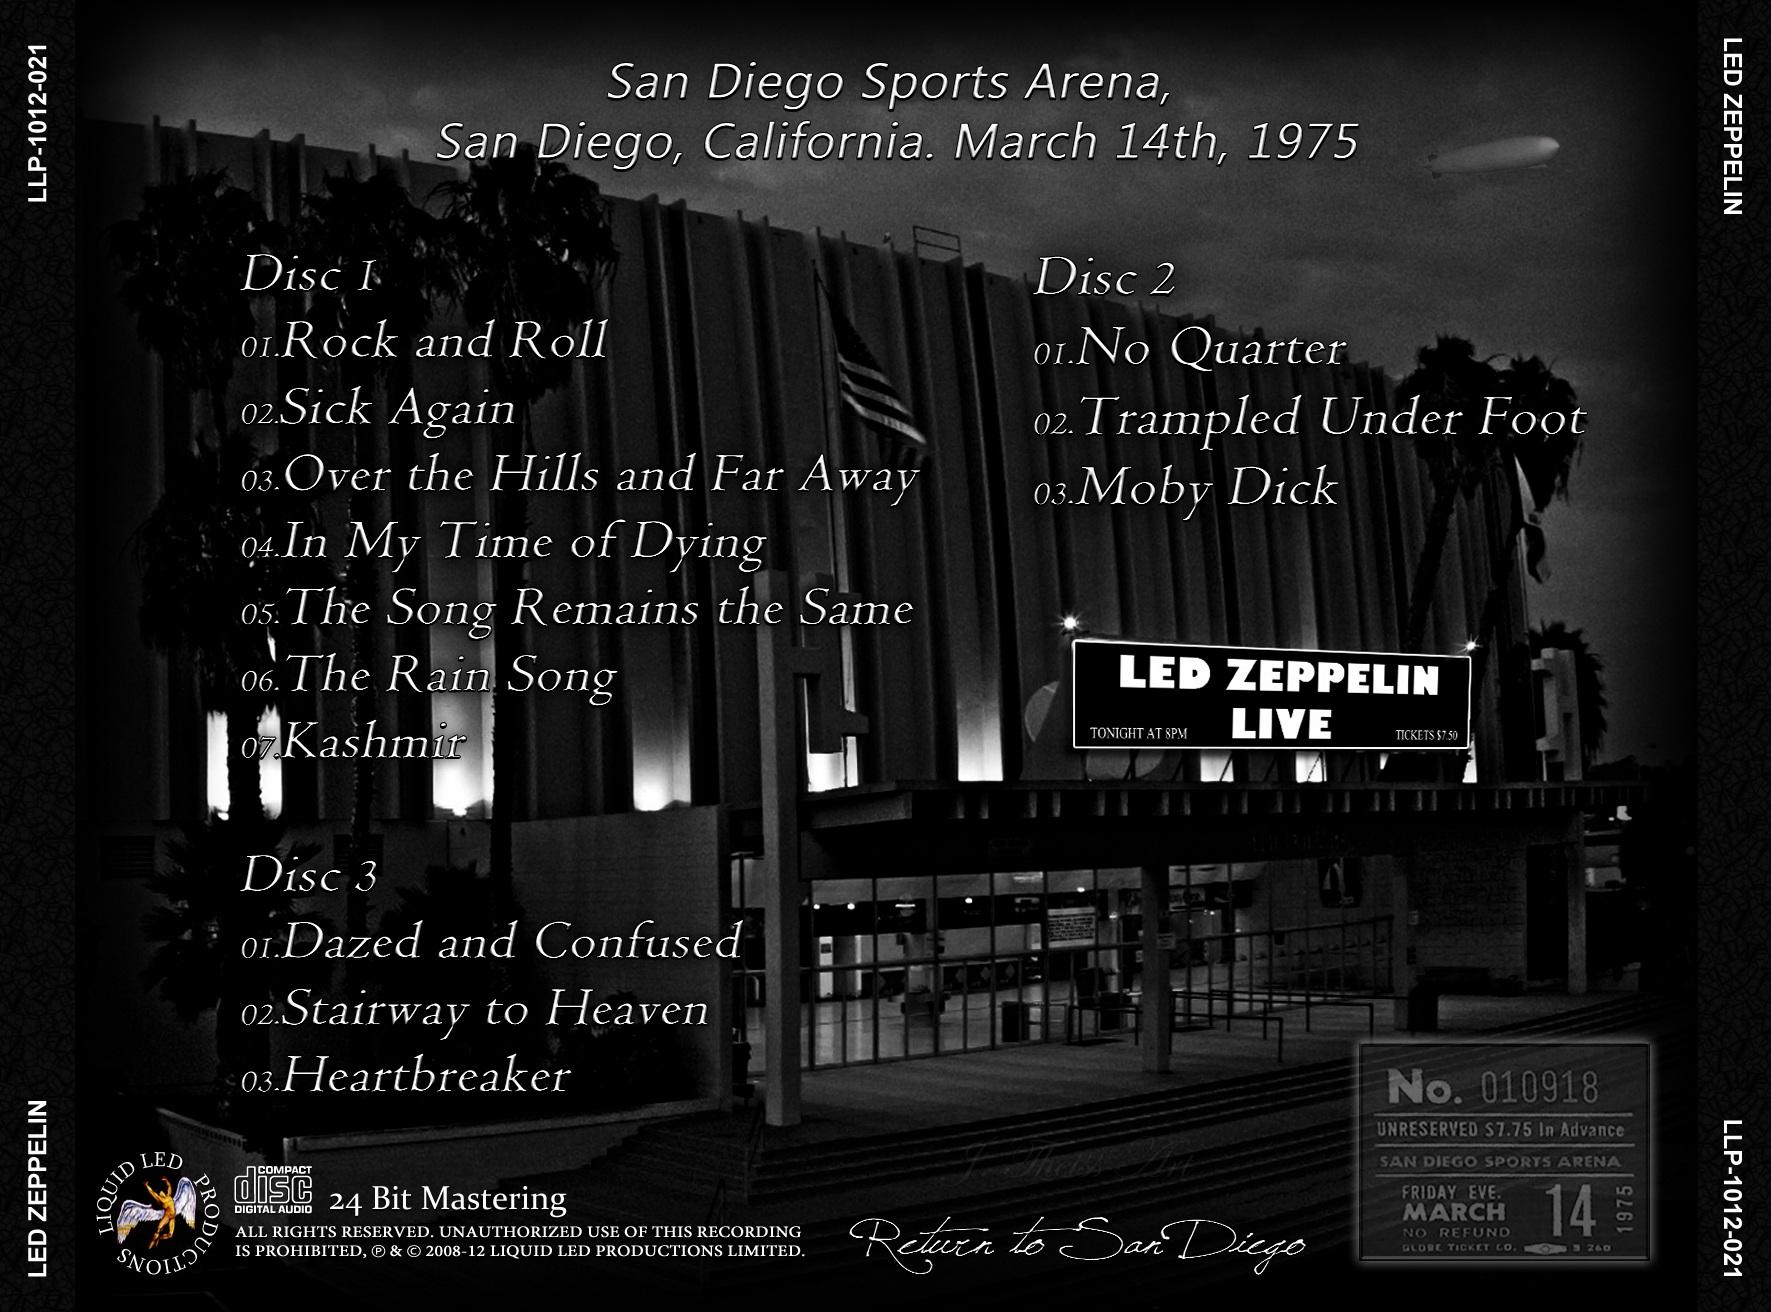 LedZeppelin1975-03-14SanDiegoSportsArenaCA.jpg